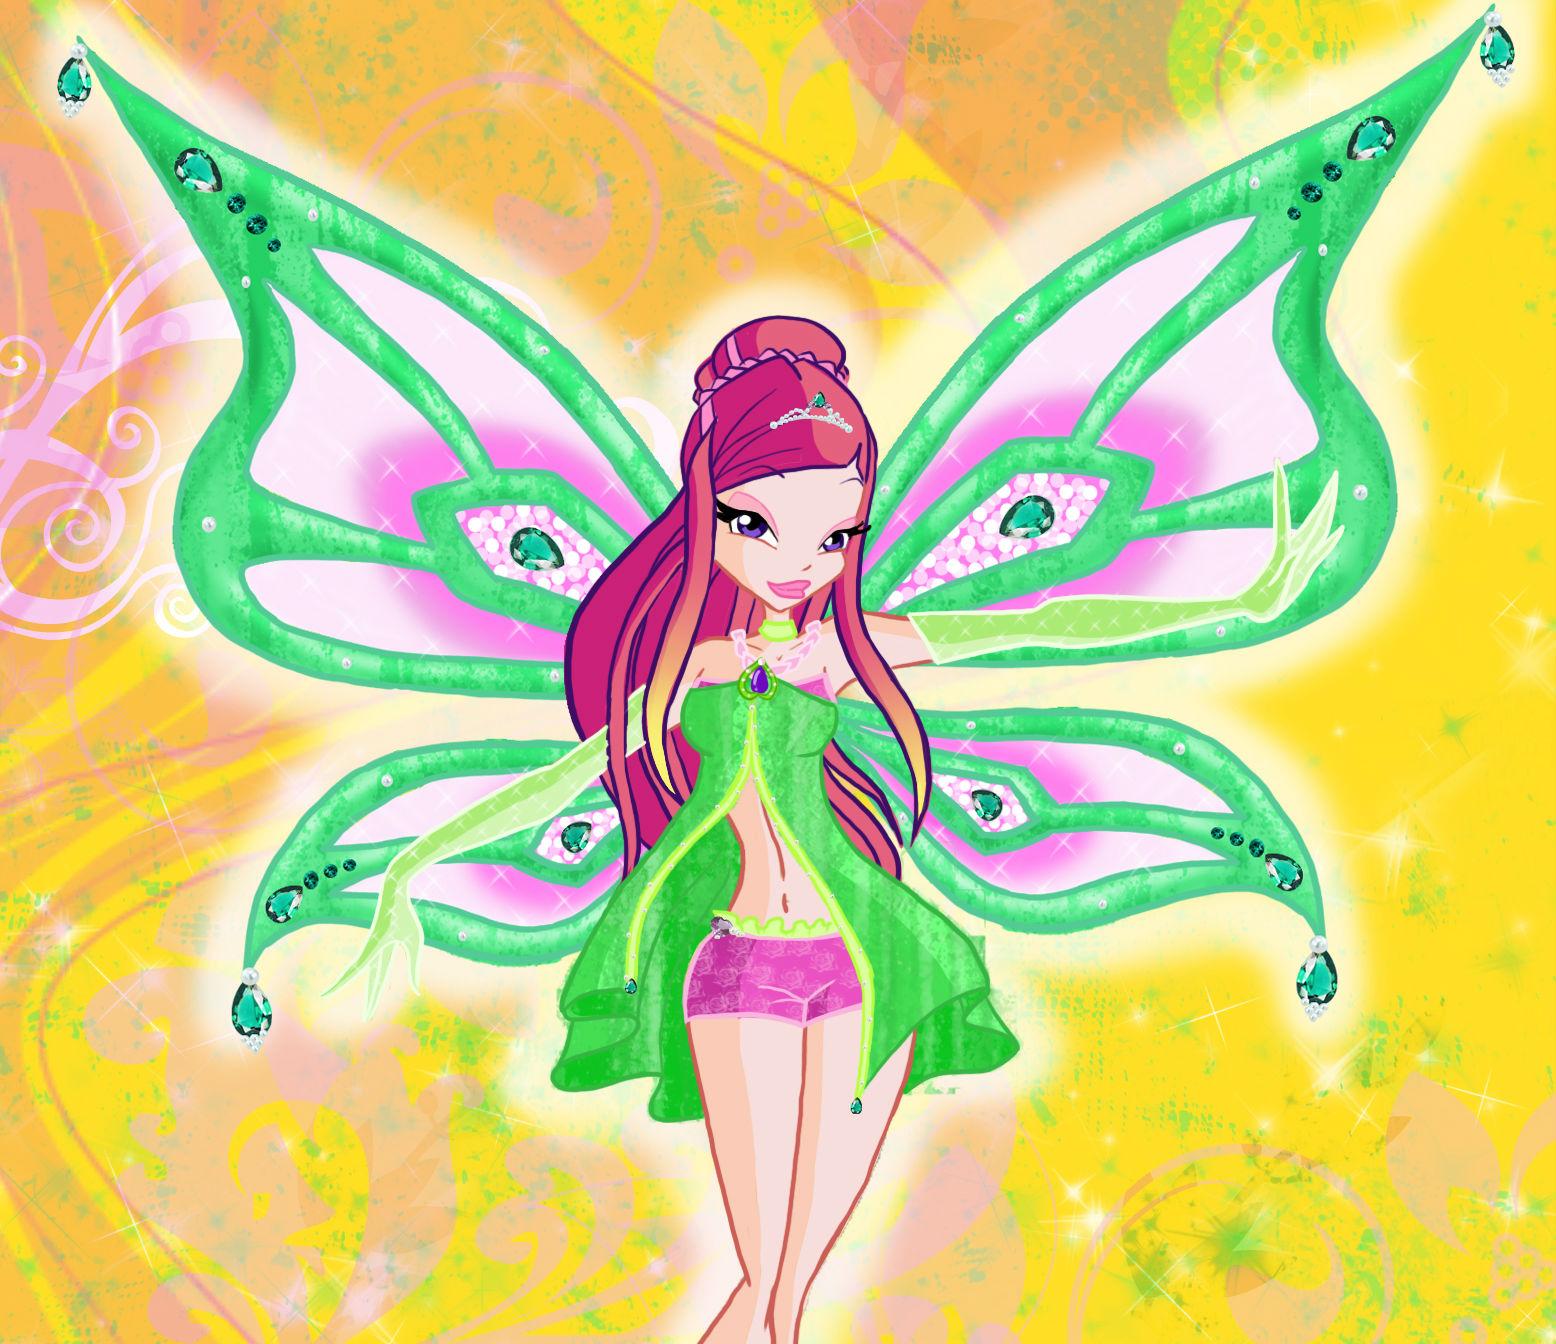 Music Wallpaper Iphone Winx Club Fairy Dd Wallpaper 1556x1344 184823